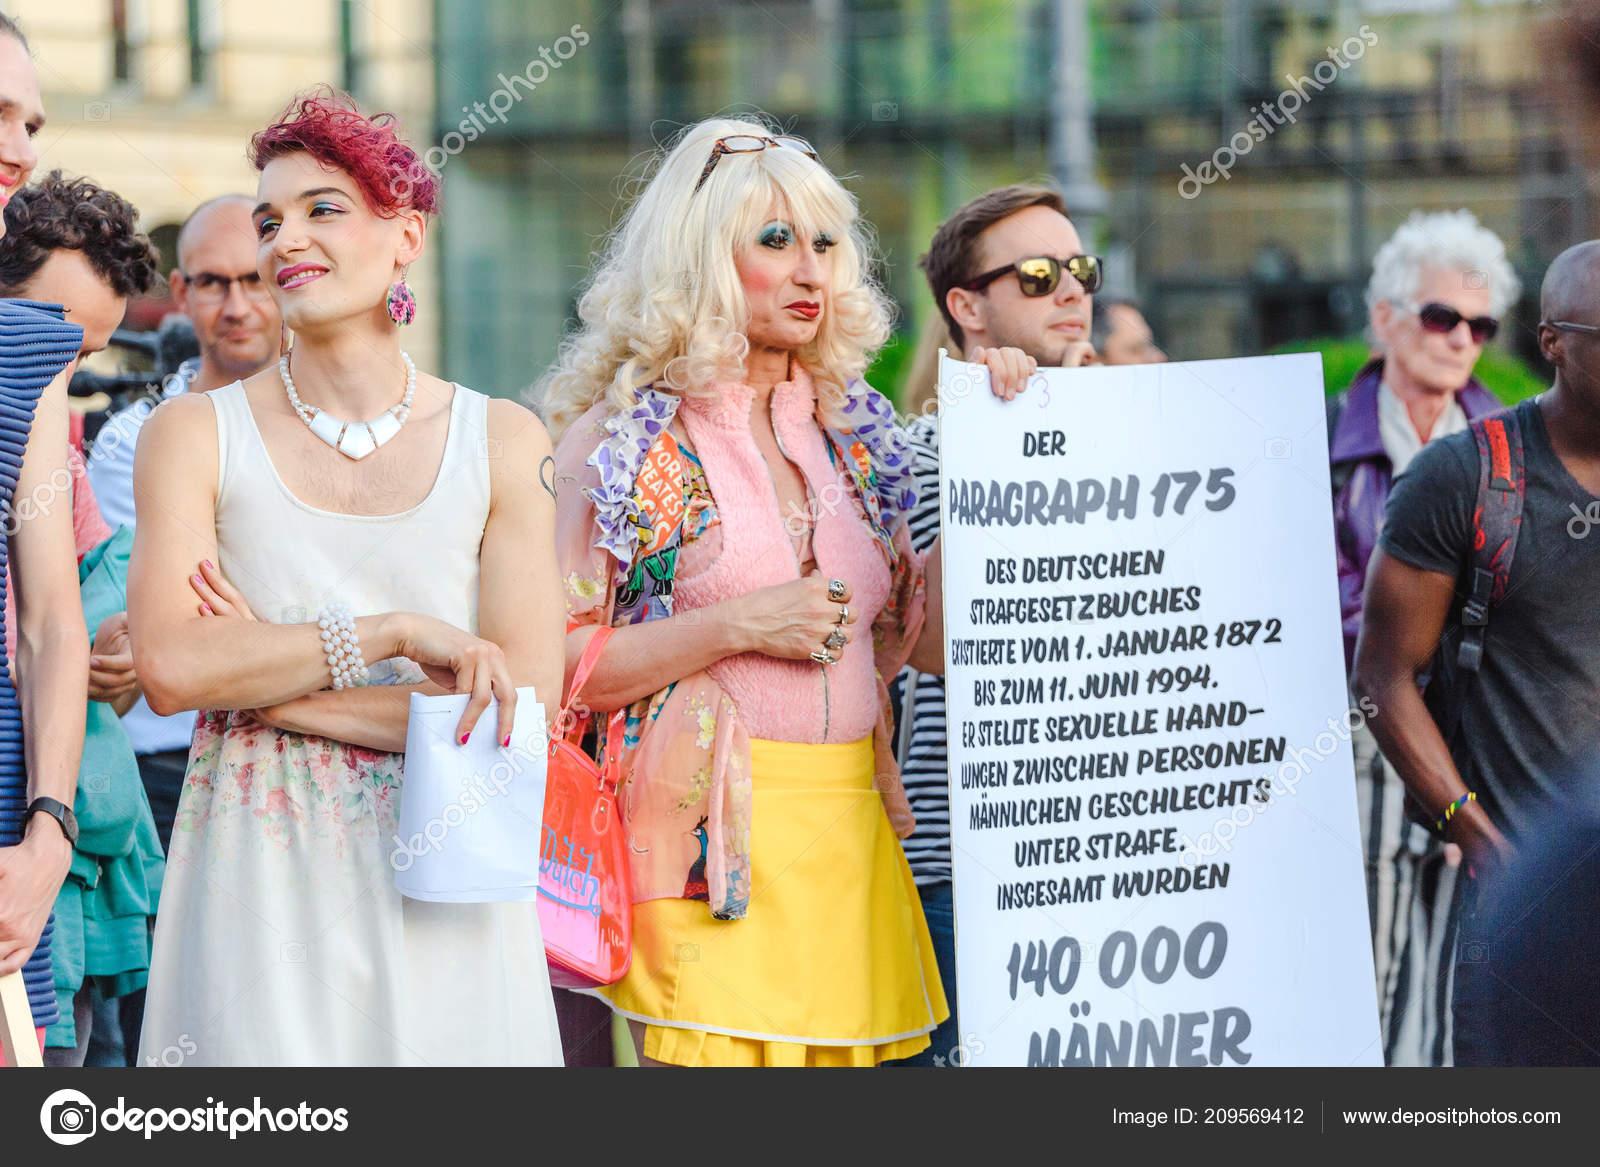 transsexual berlin